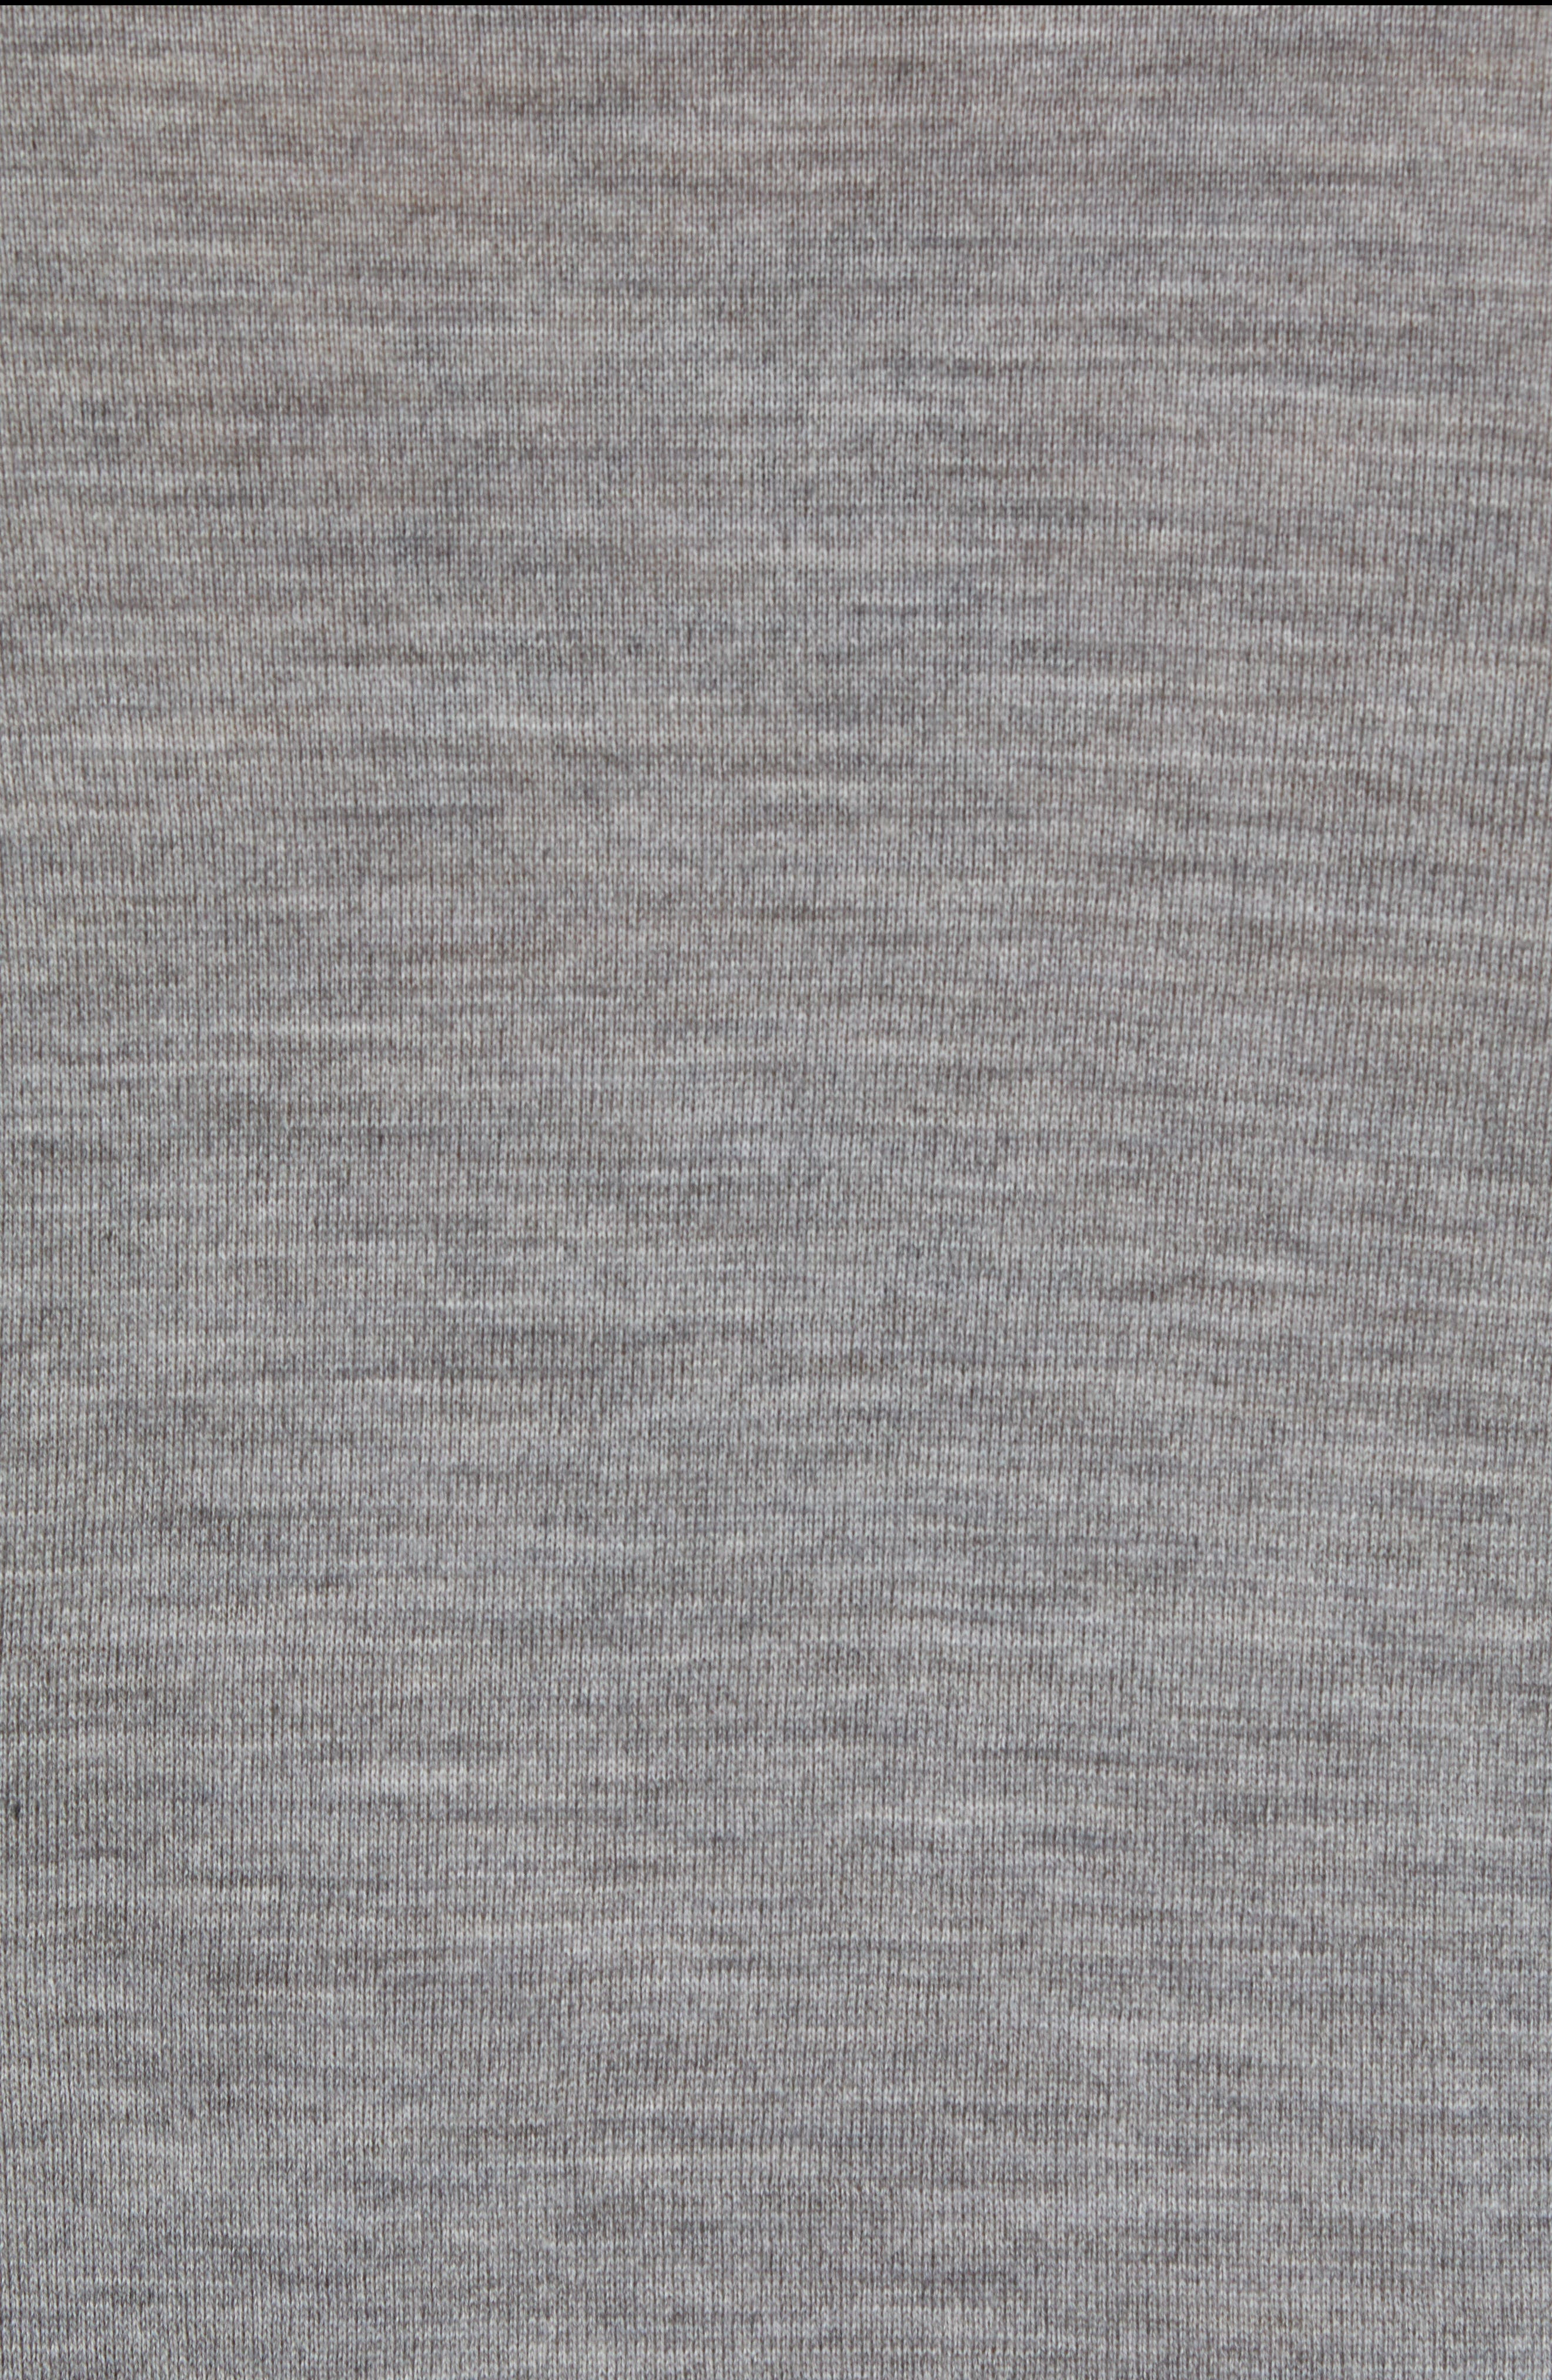 Mode Slim Fit Merino Wool Sweater,                             Alternate thumbnail 29, color,